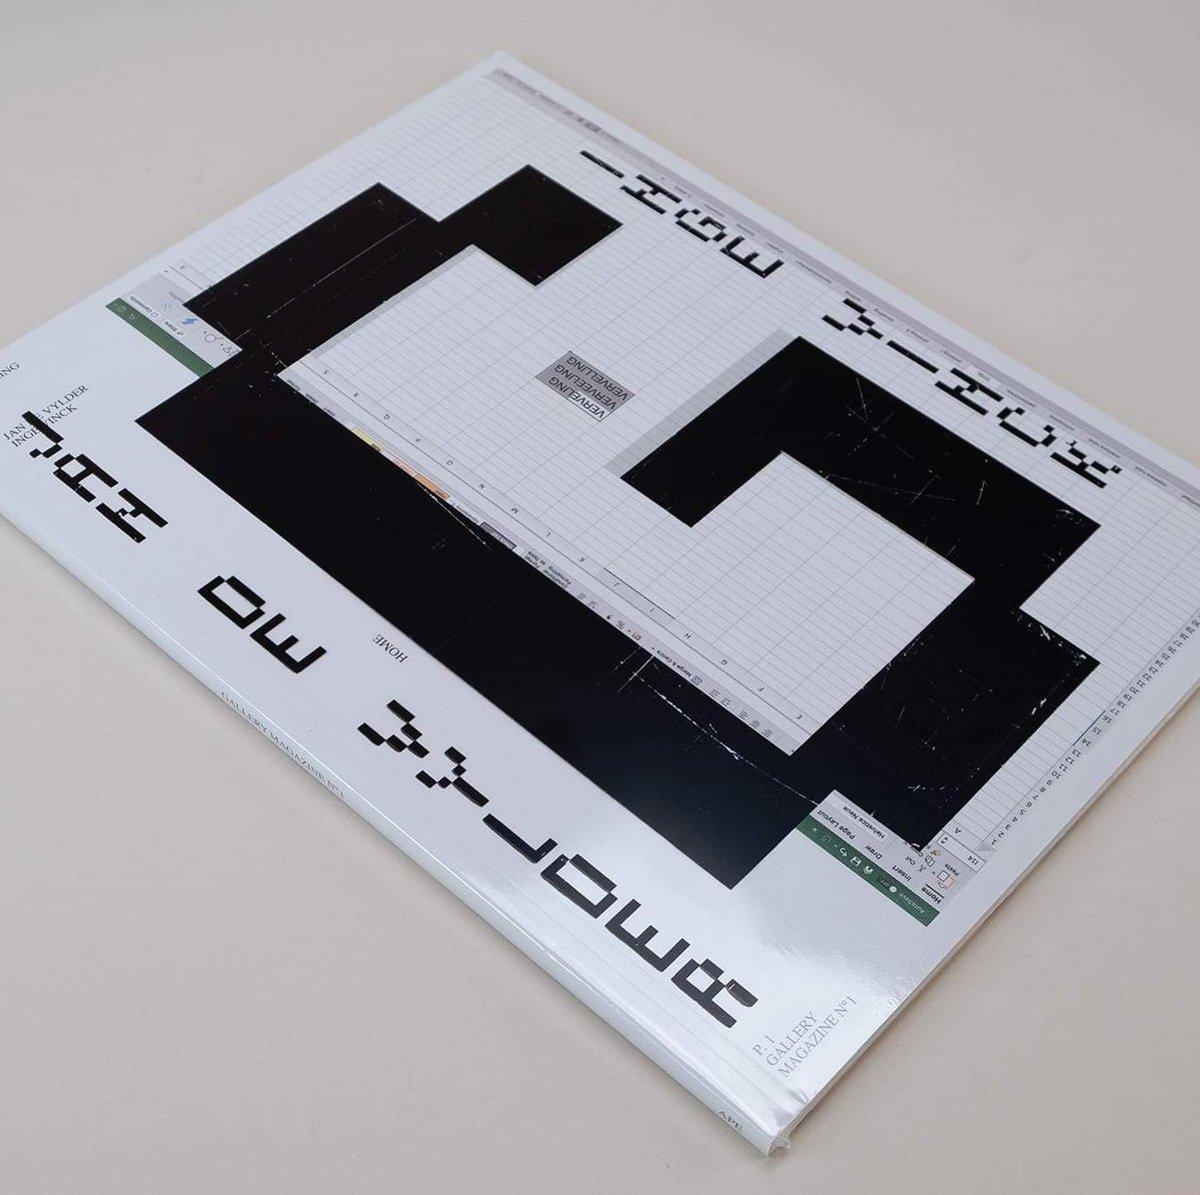 CARROUSEL JOURNEY UNIVERSUM 2 - Flag 21